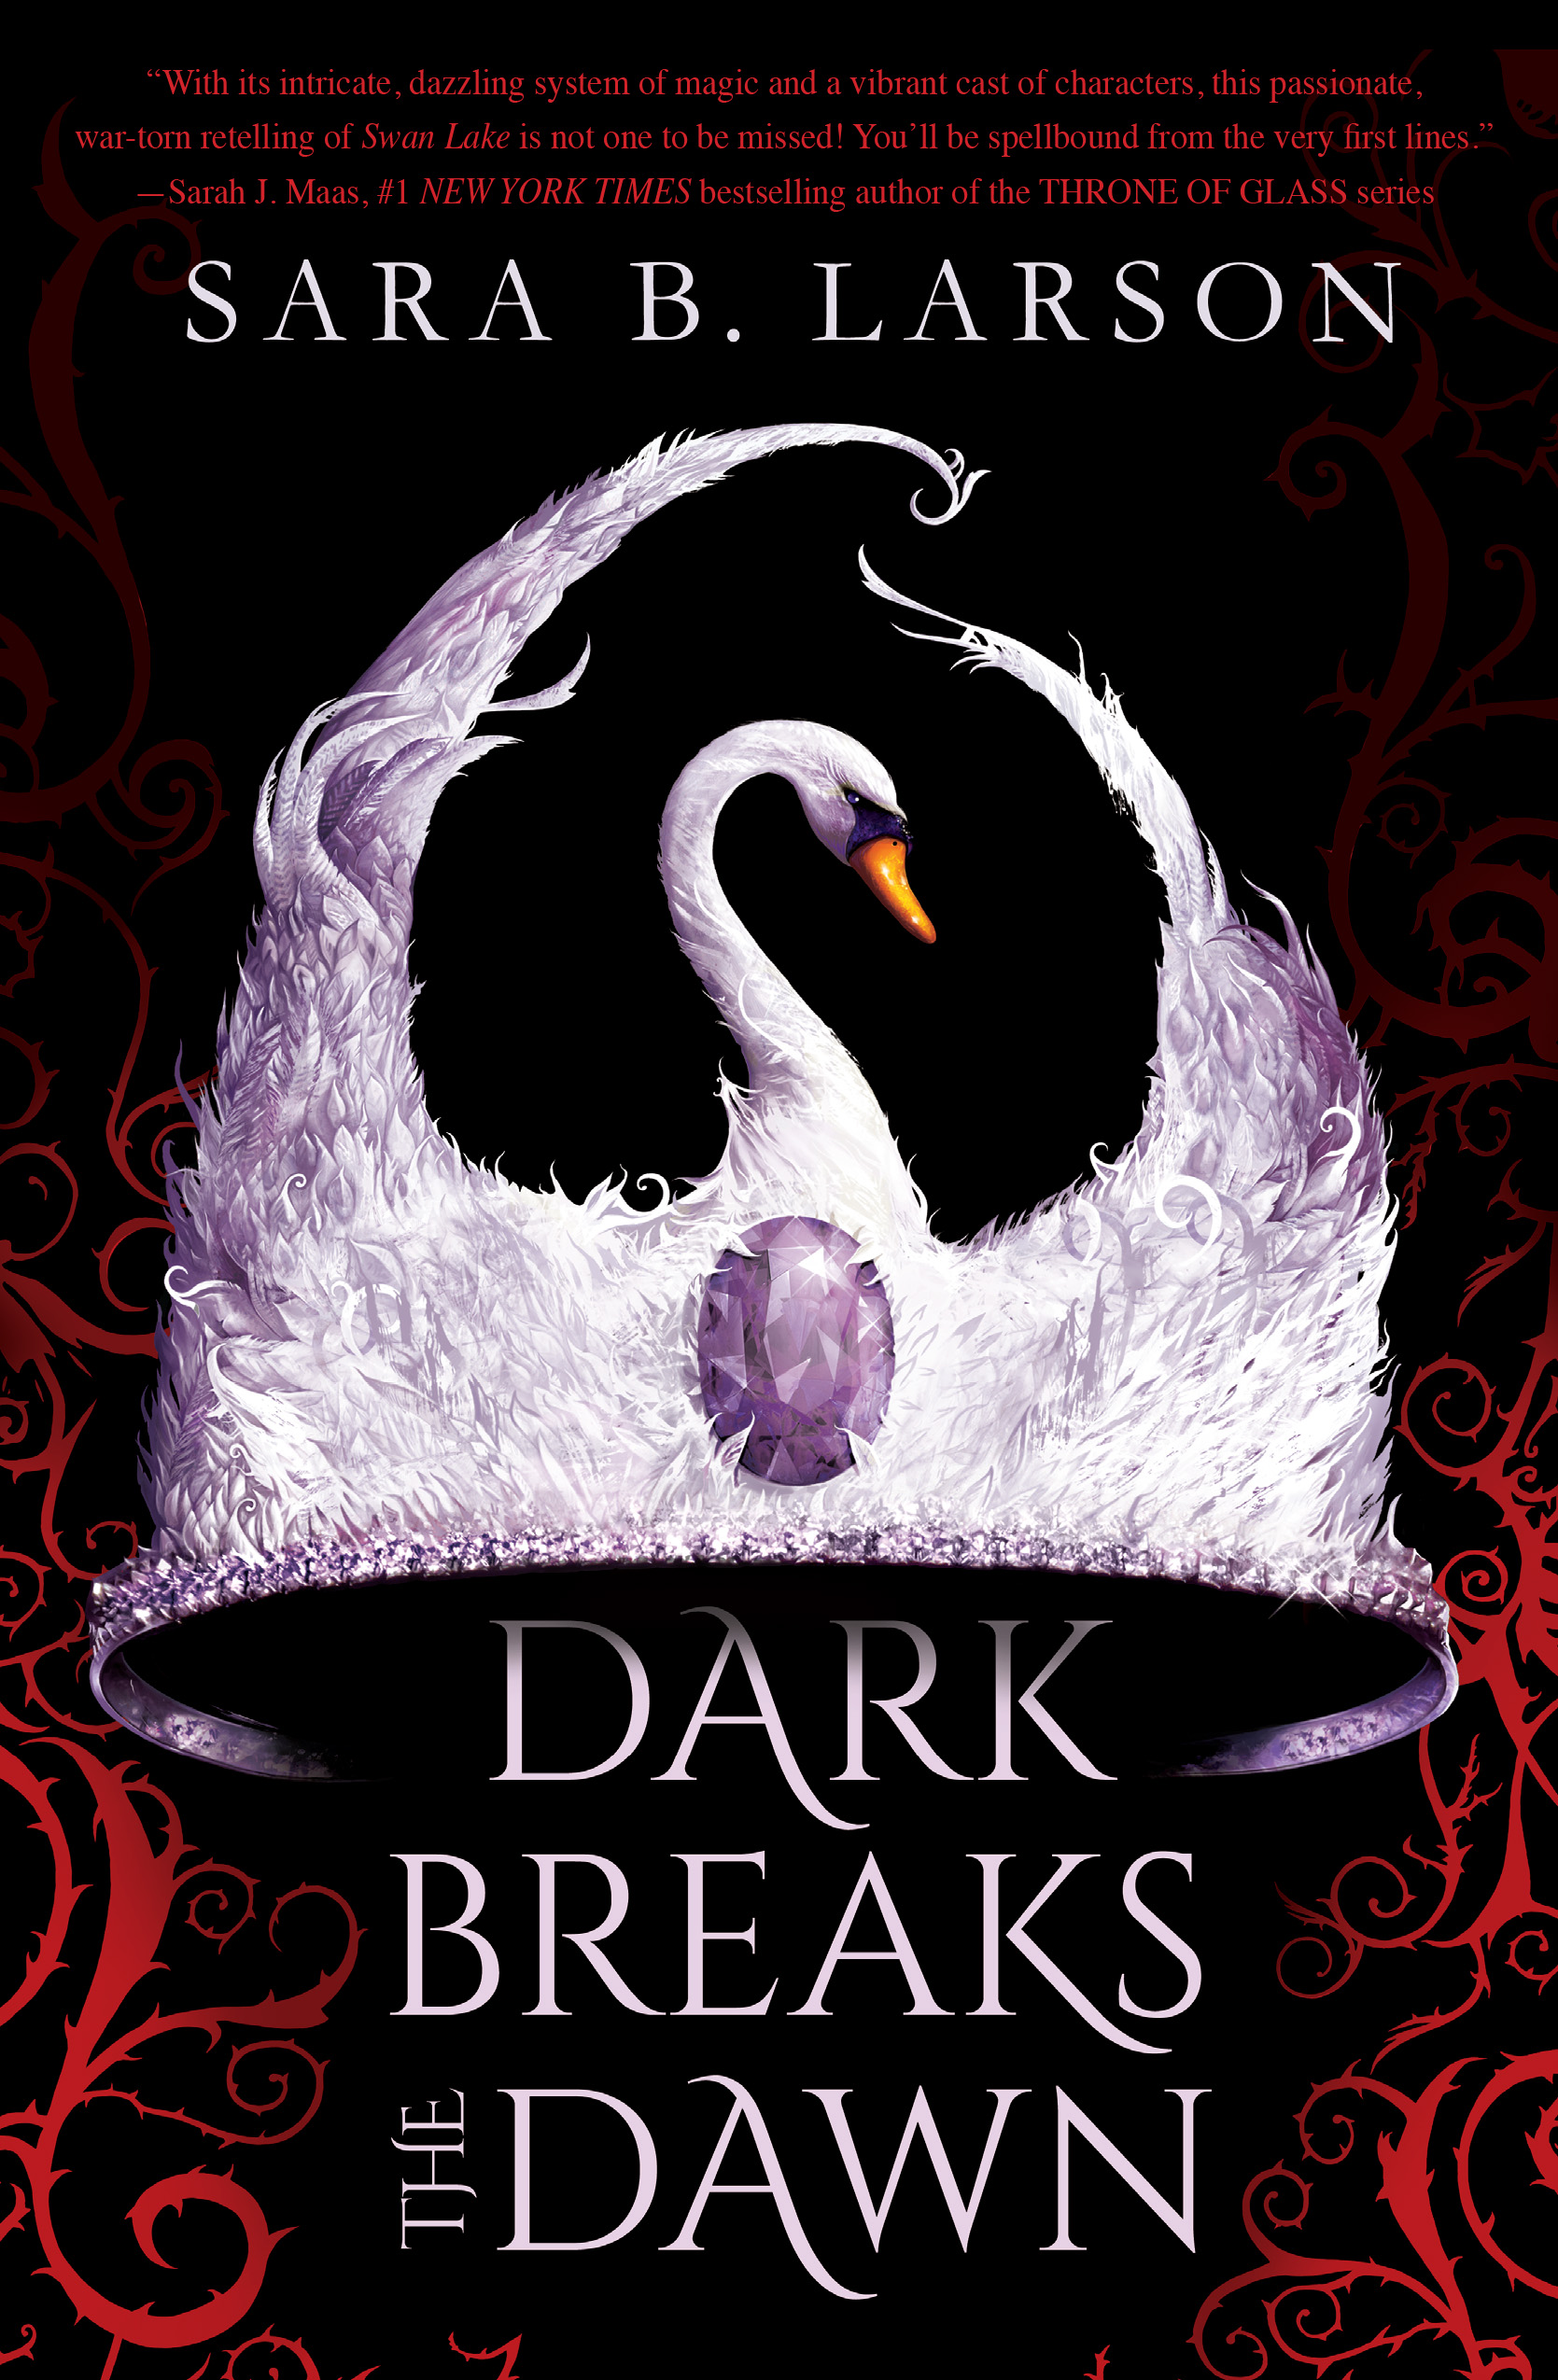 Dark Breaks Dawn cover.jpg